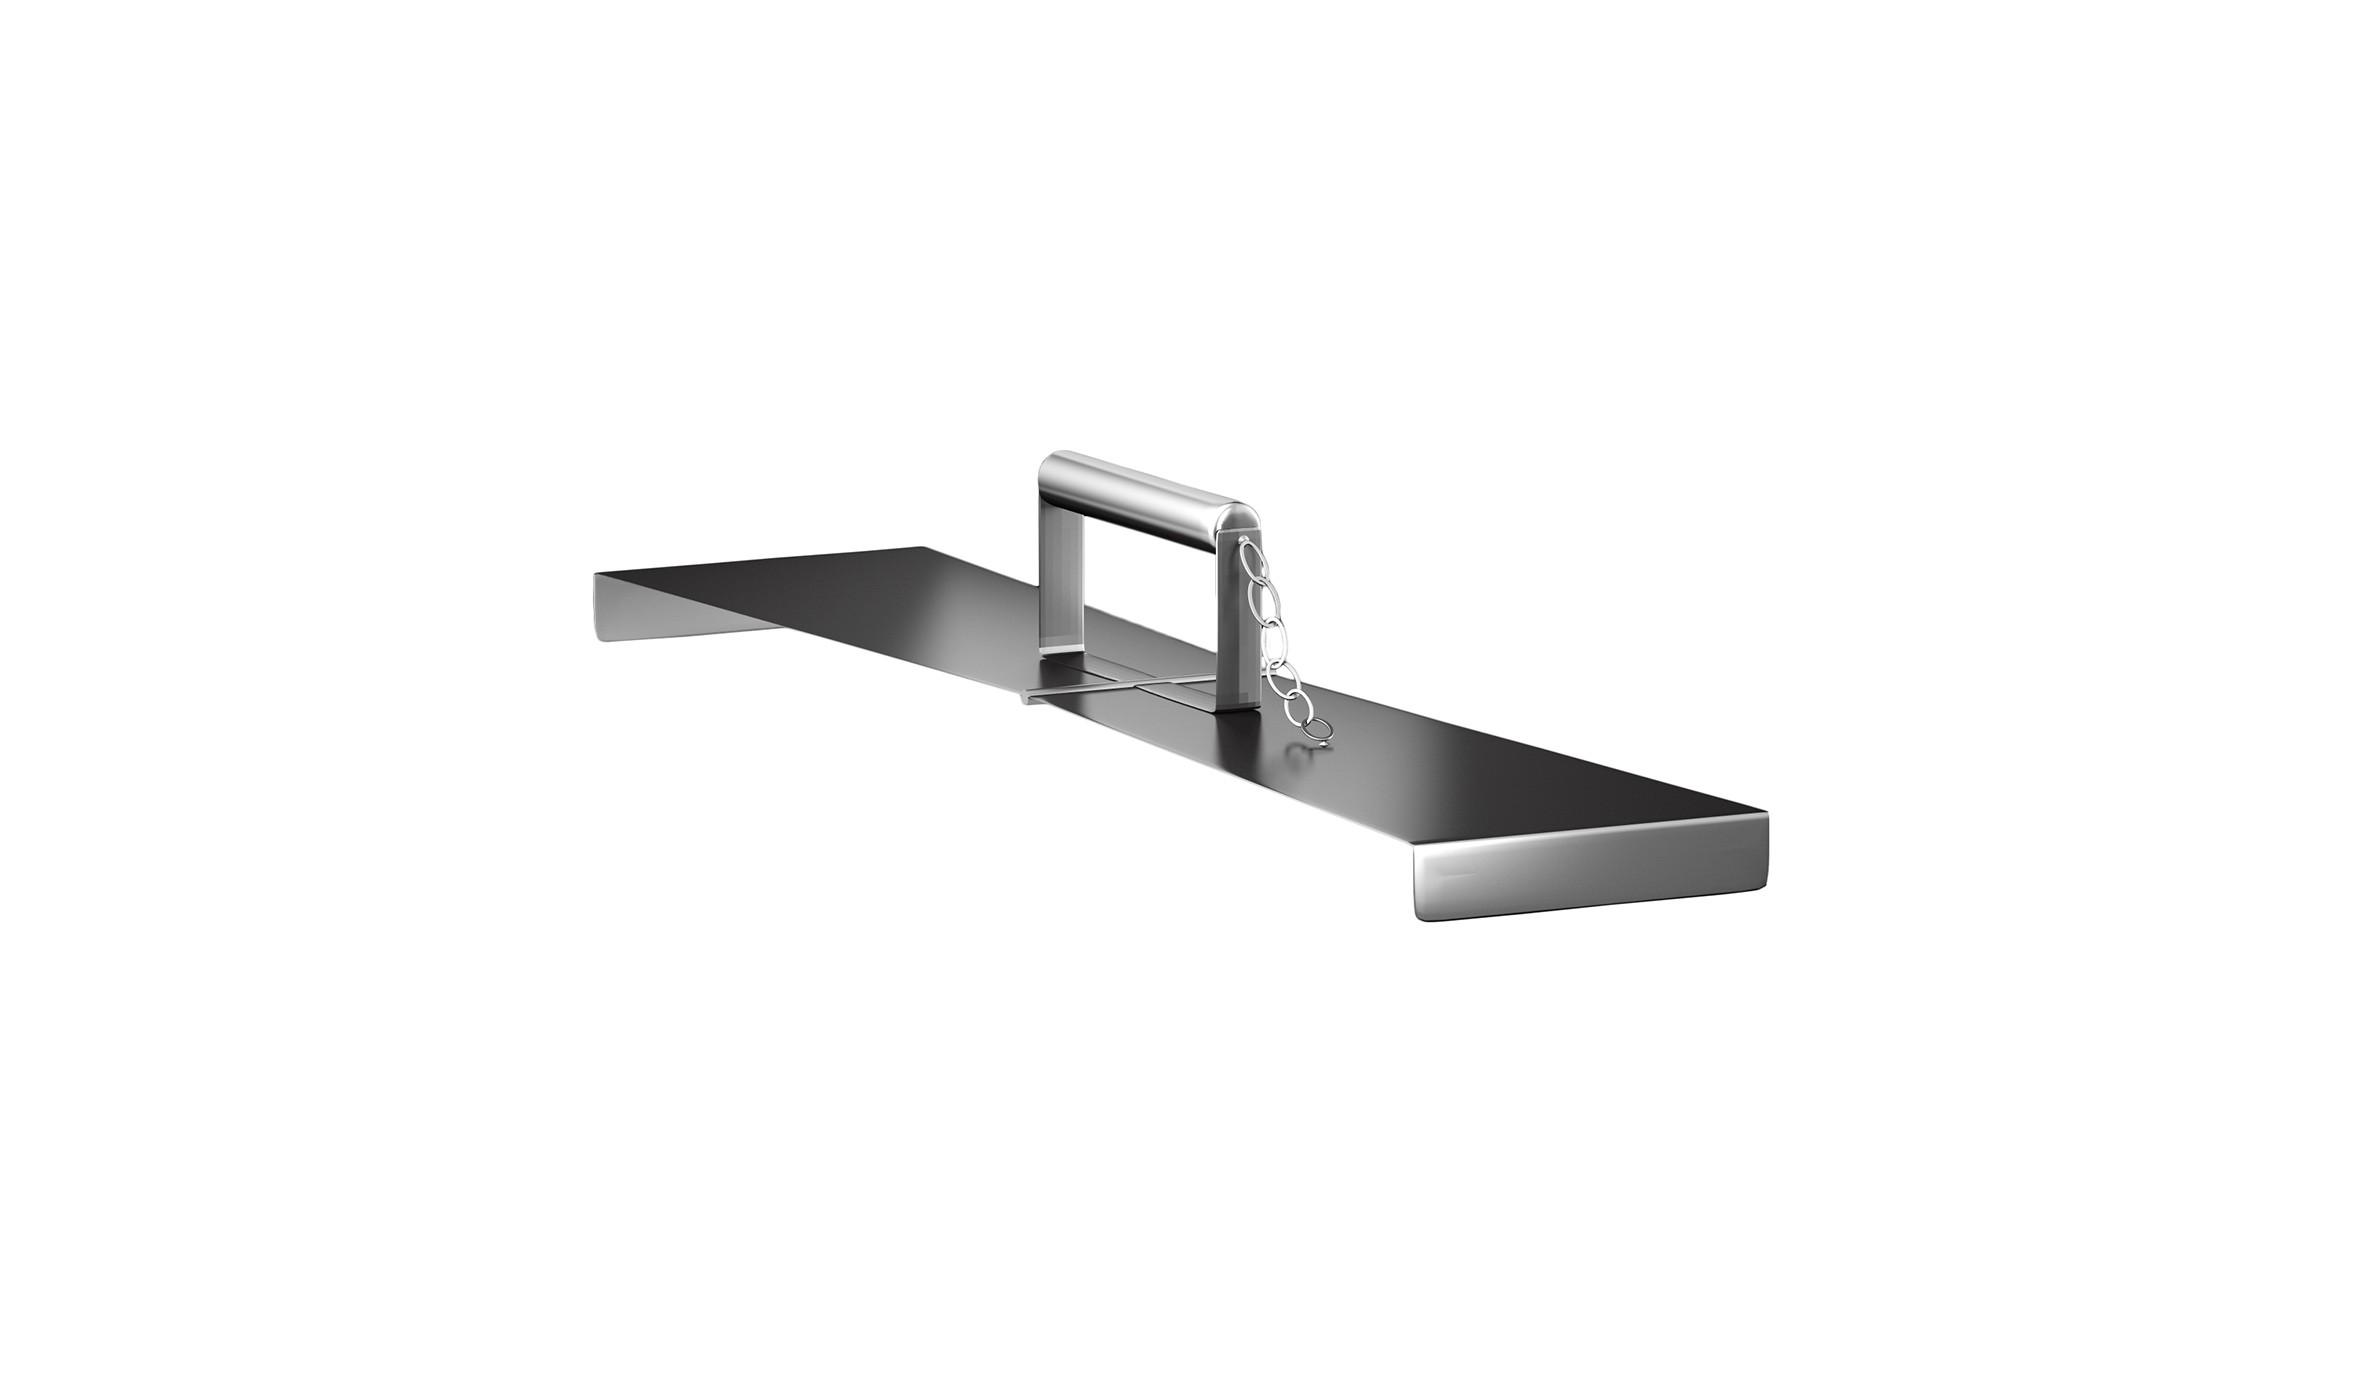 Install-Products-Photos Pedestals Thumbnail Accessories-lifting-handle-thumbnail-300